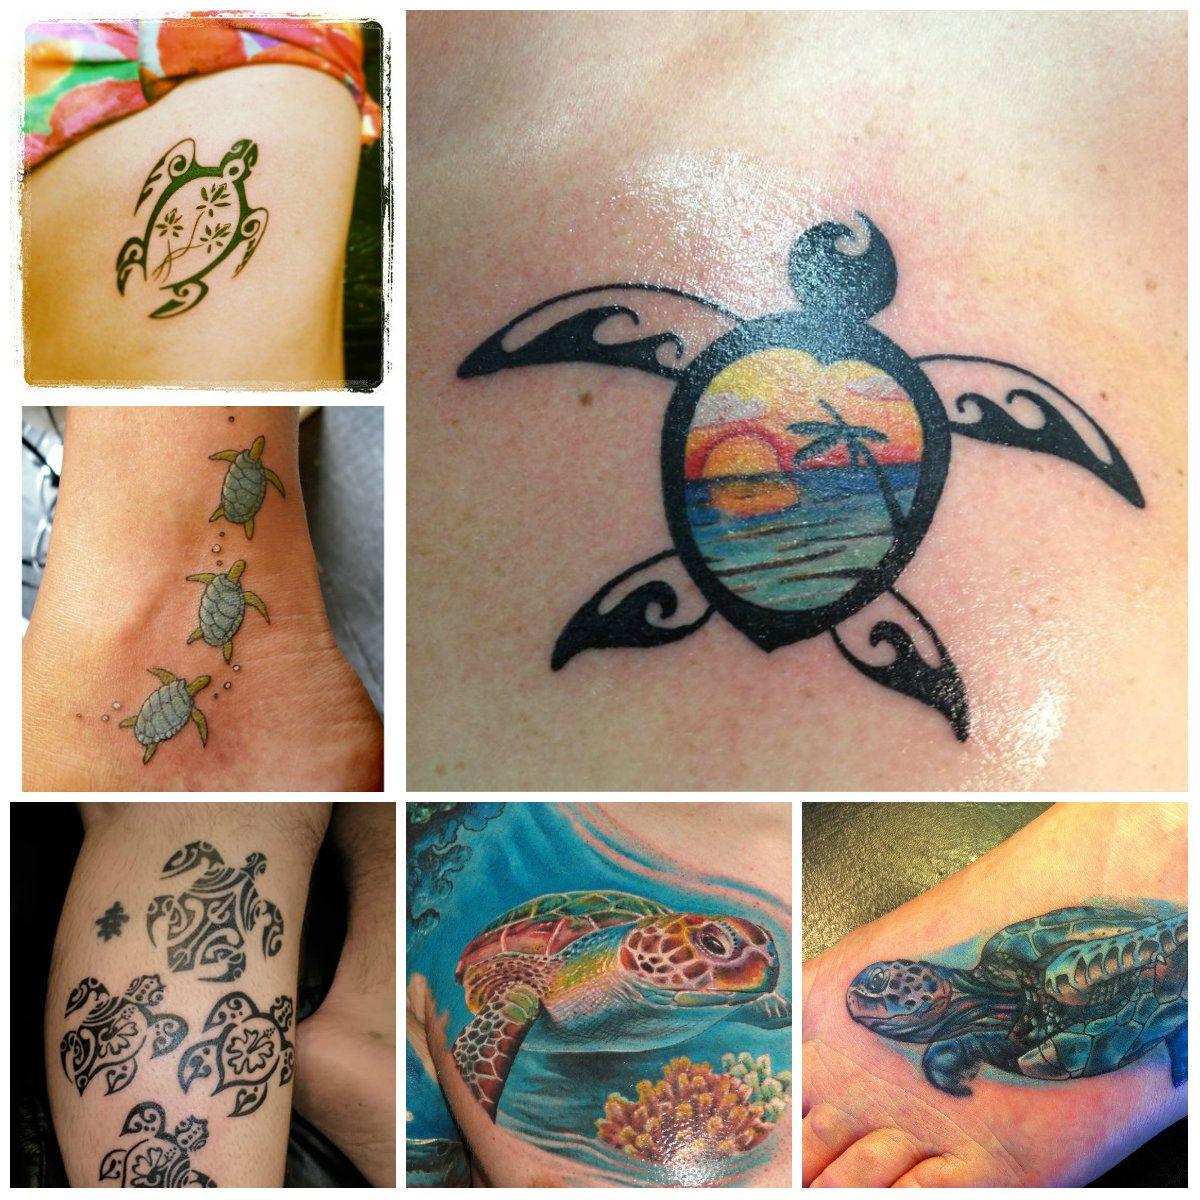 Sea turtle tattoo 2016 tats pinterest turtle tattoo and sea turtle tattoo 2016 biocorpaavc Choice Image